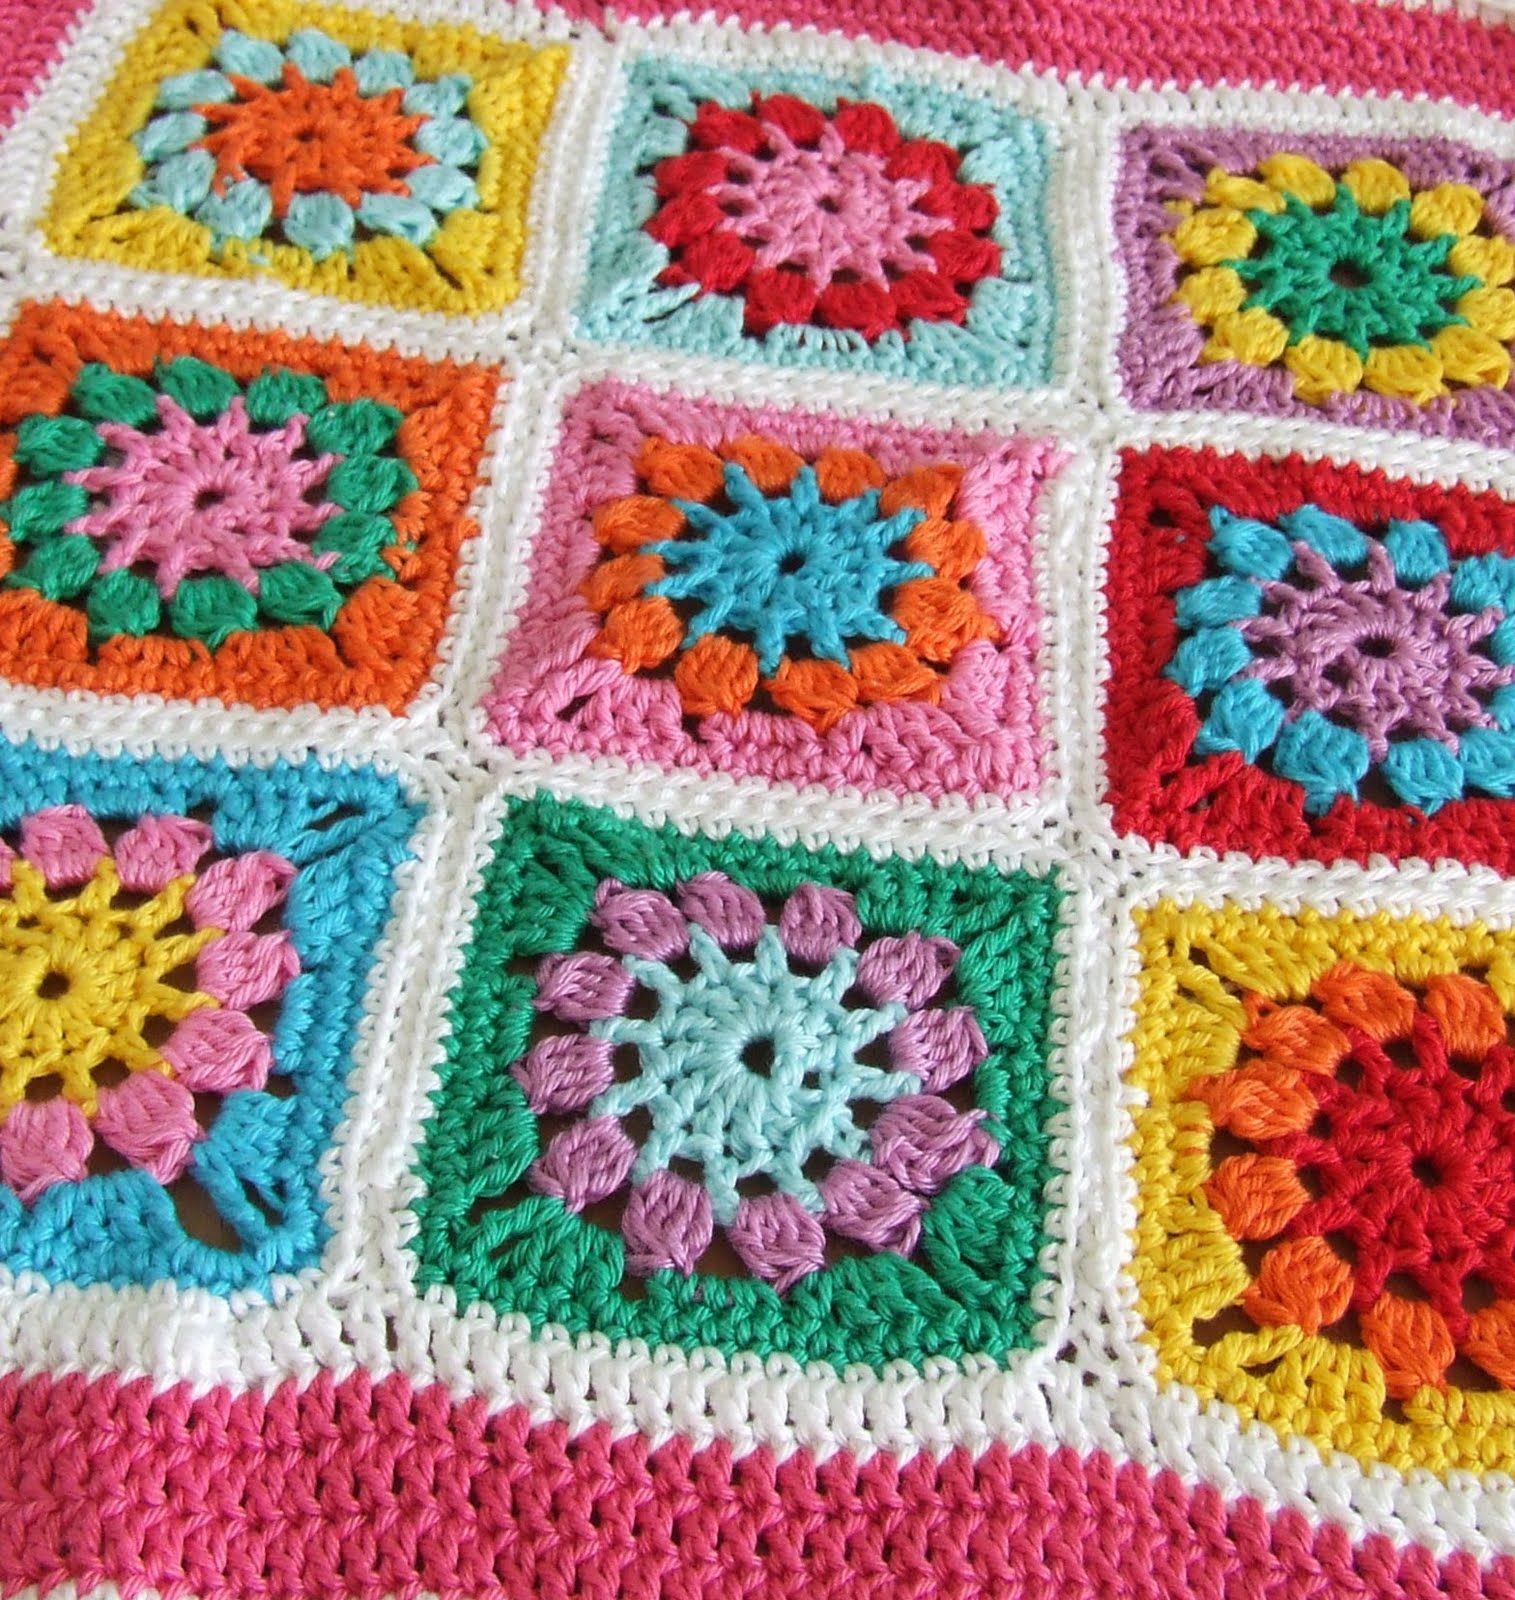 Pin de Gloria en Muestras de crochet | Pinterest | Muestras de crochet